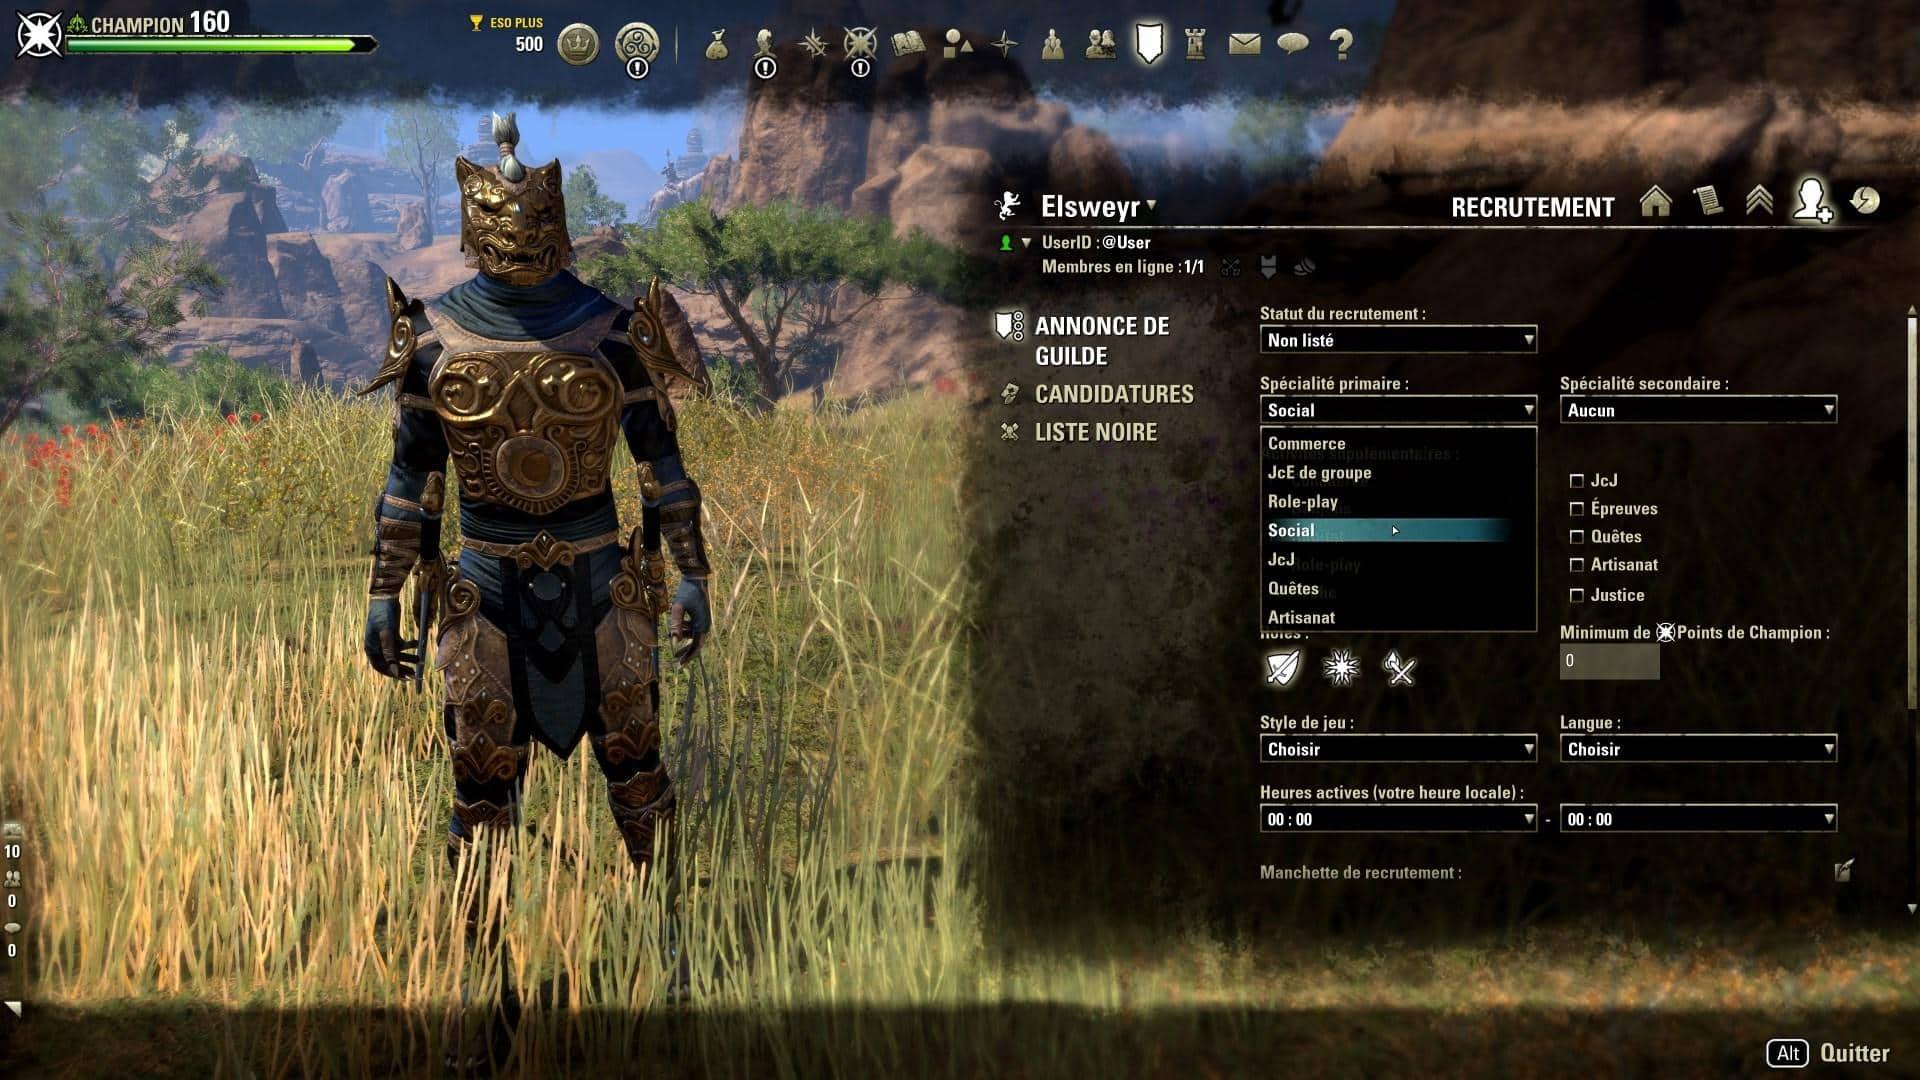 Est-il matchmaking dans Elder Scrolls en ligne